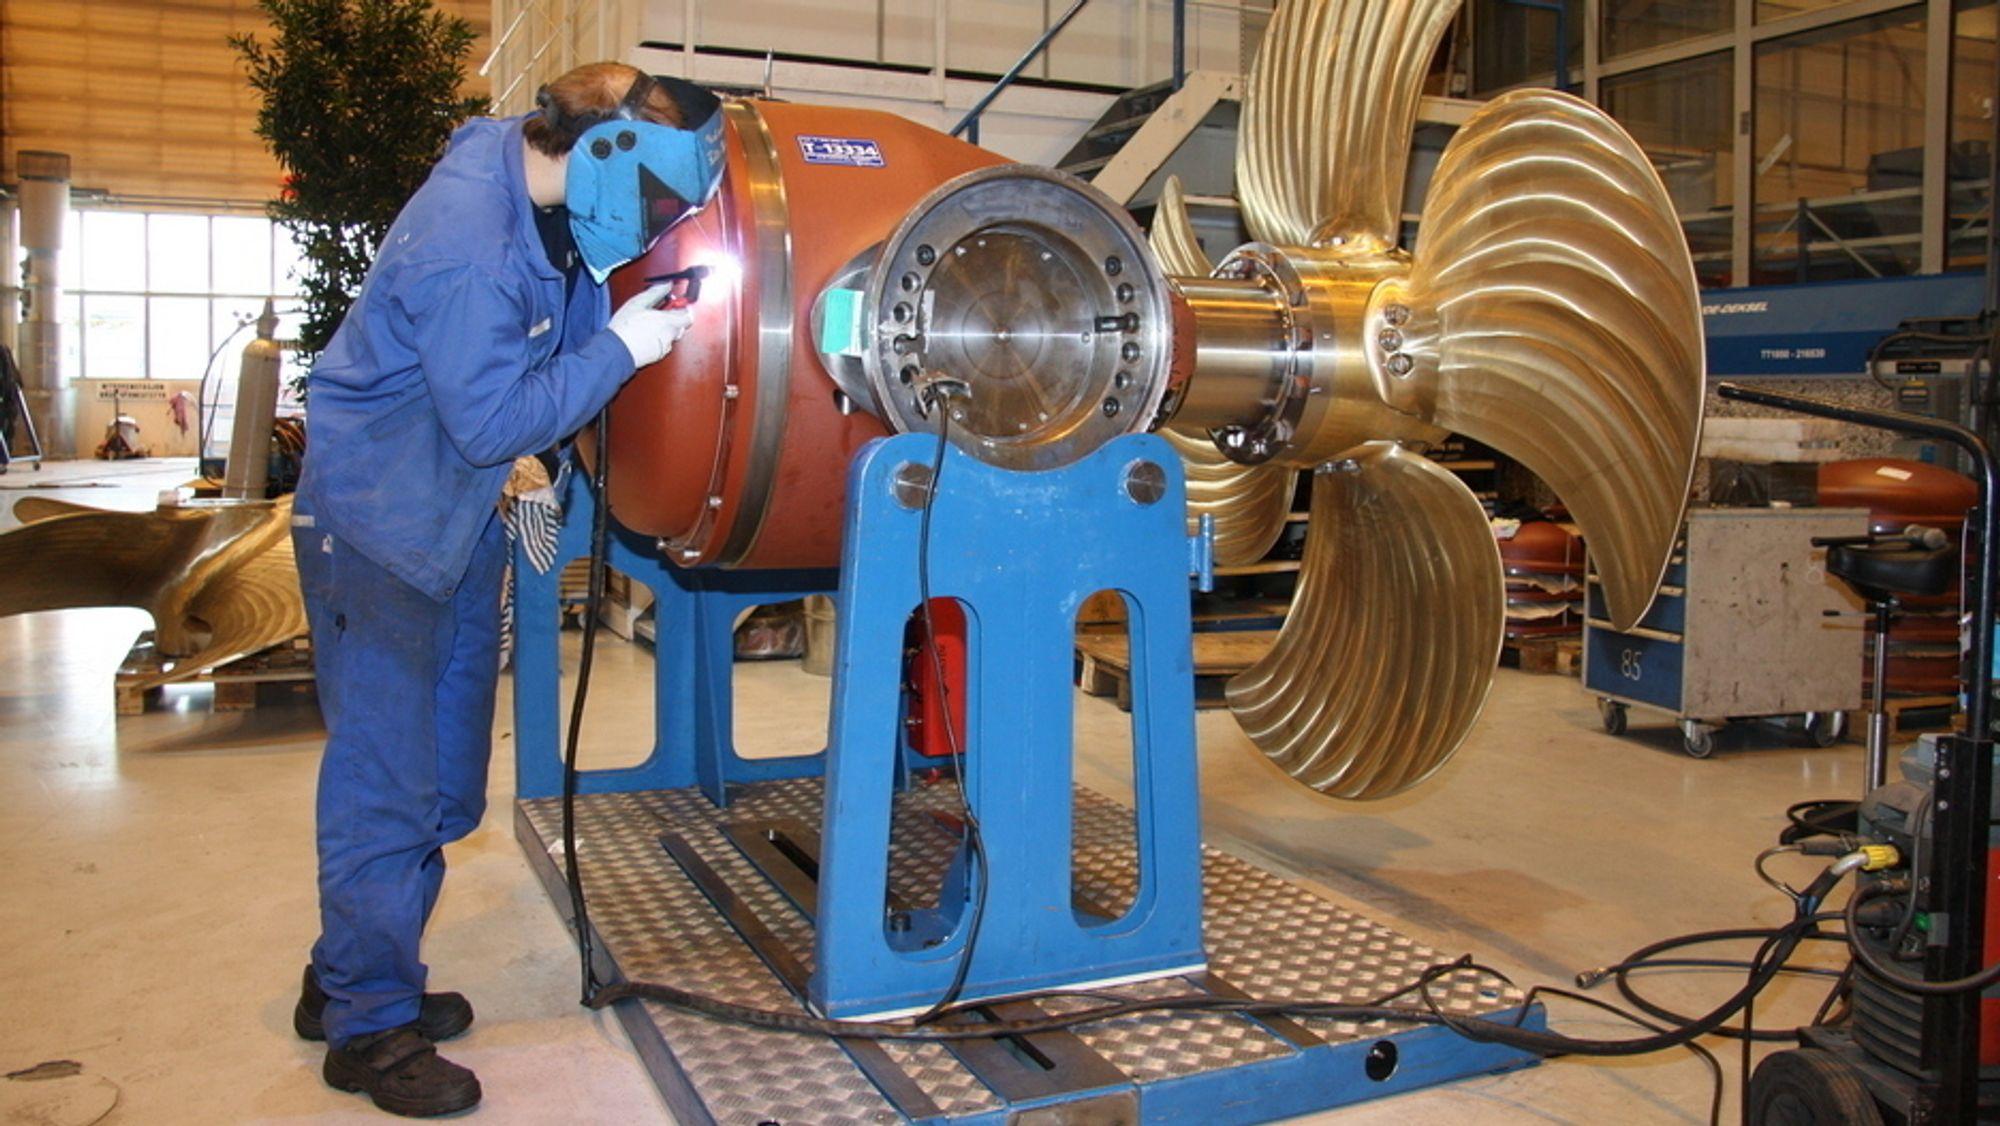 Rolls-Royce i Ulsteinvik lager blant annet baugpropeller.